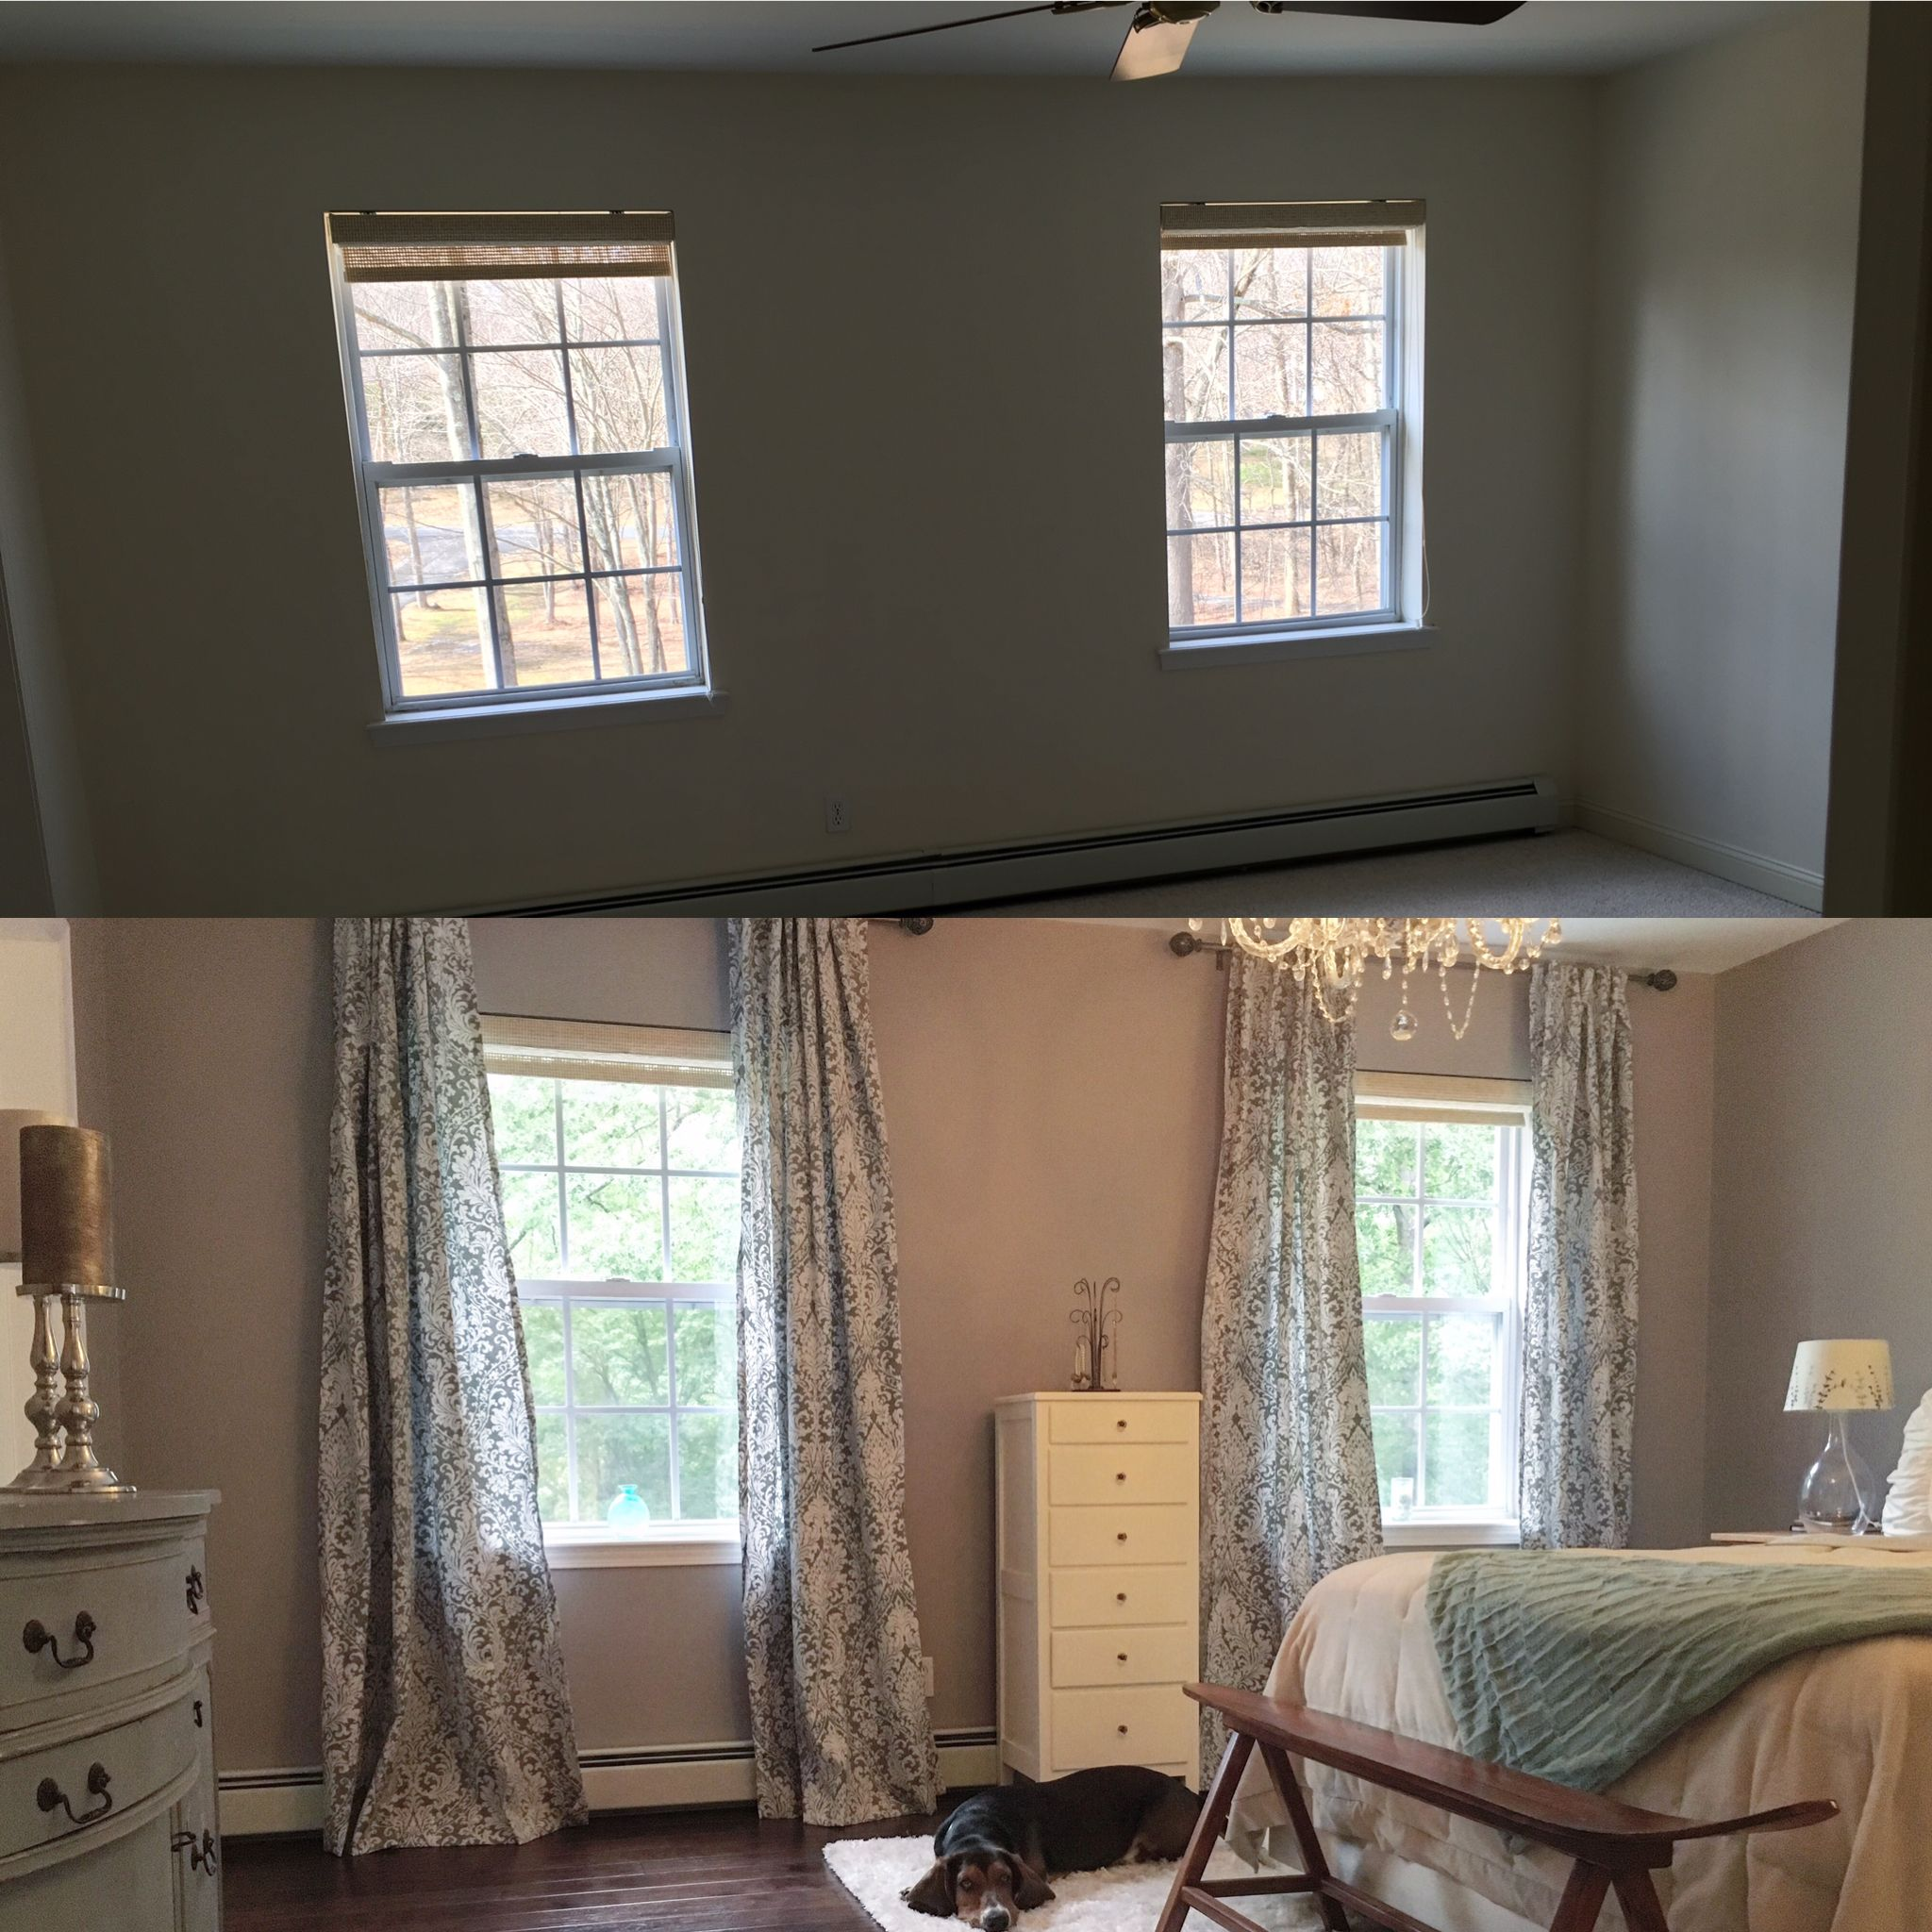 Master bedroom hardwood floors  Before and after master bedroom hardwood floors curtains lavender